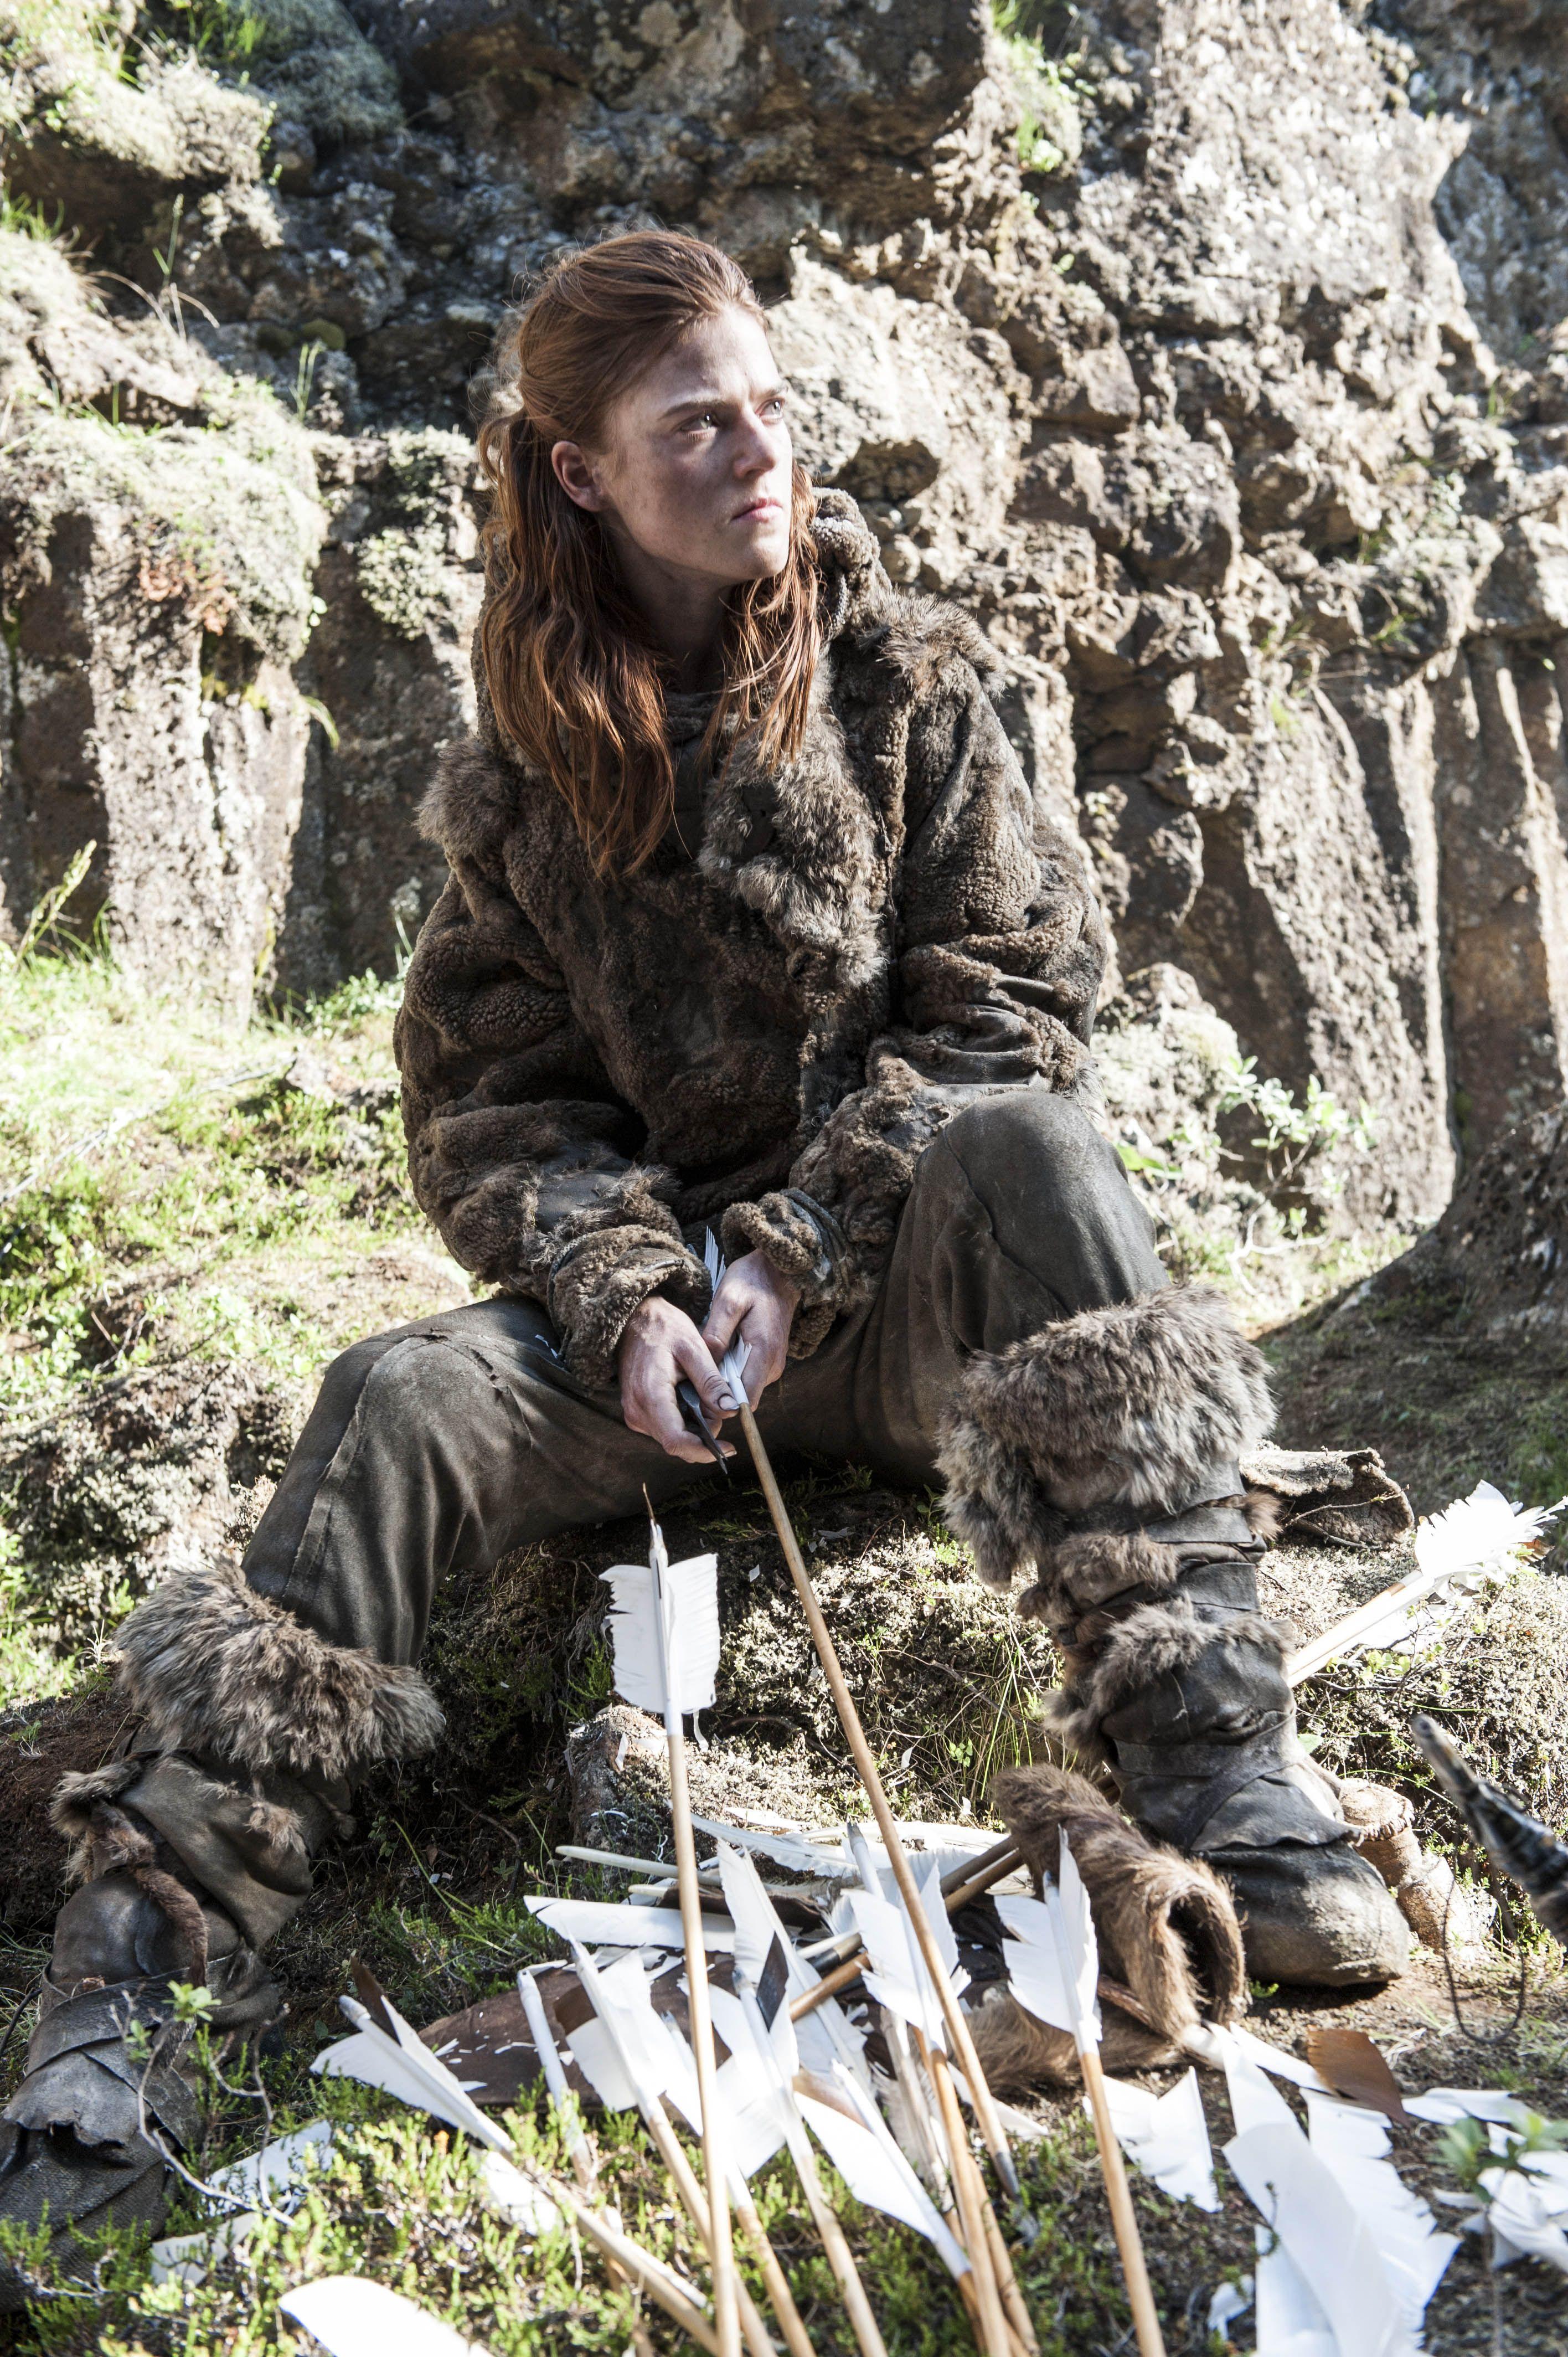 Game of Thrones Season 4 Episode 1 Still Rose leslie